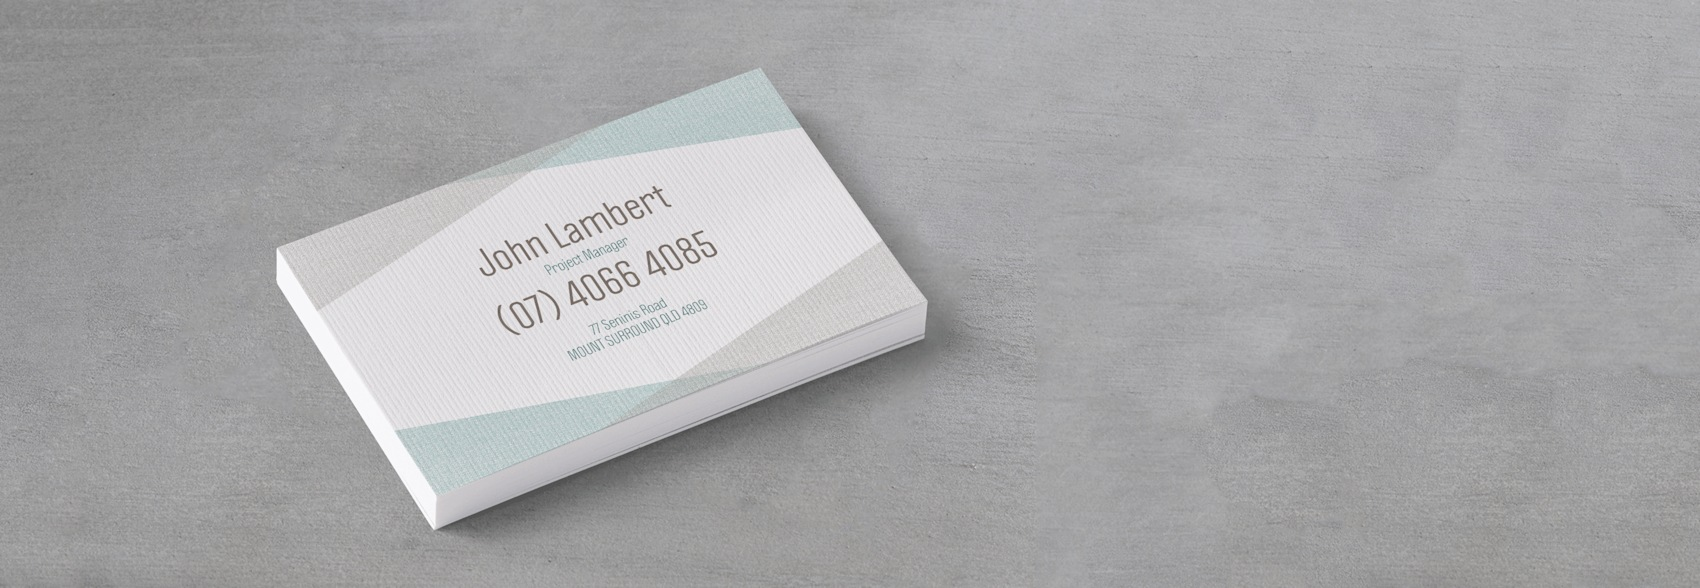 Ridged business cards